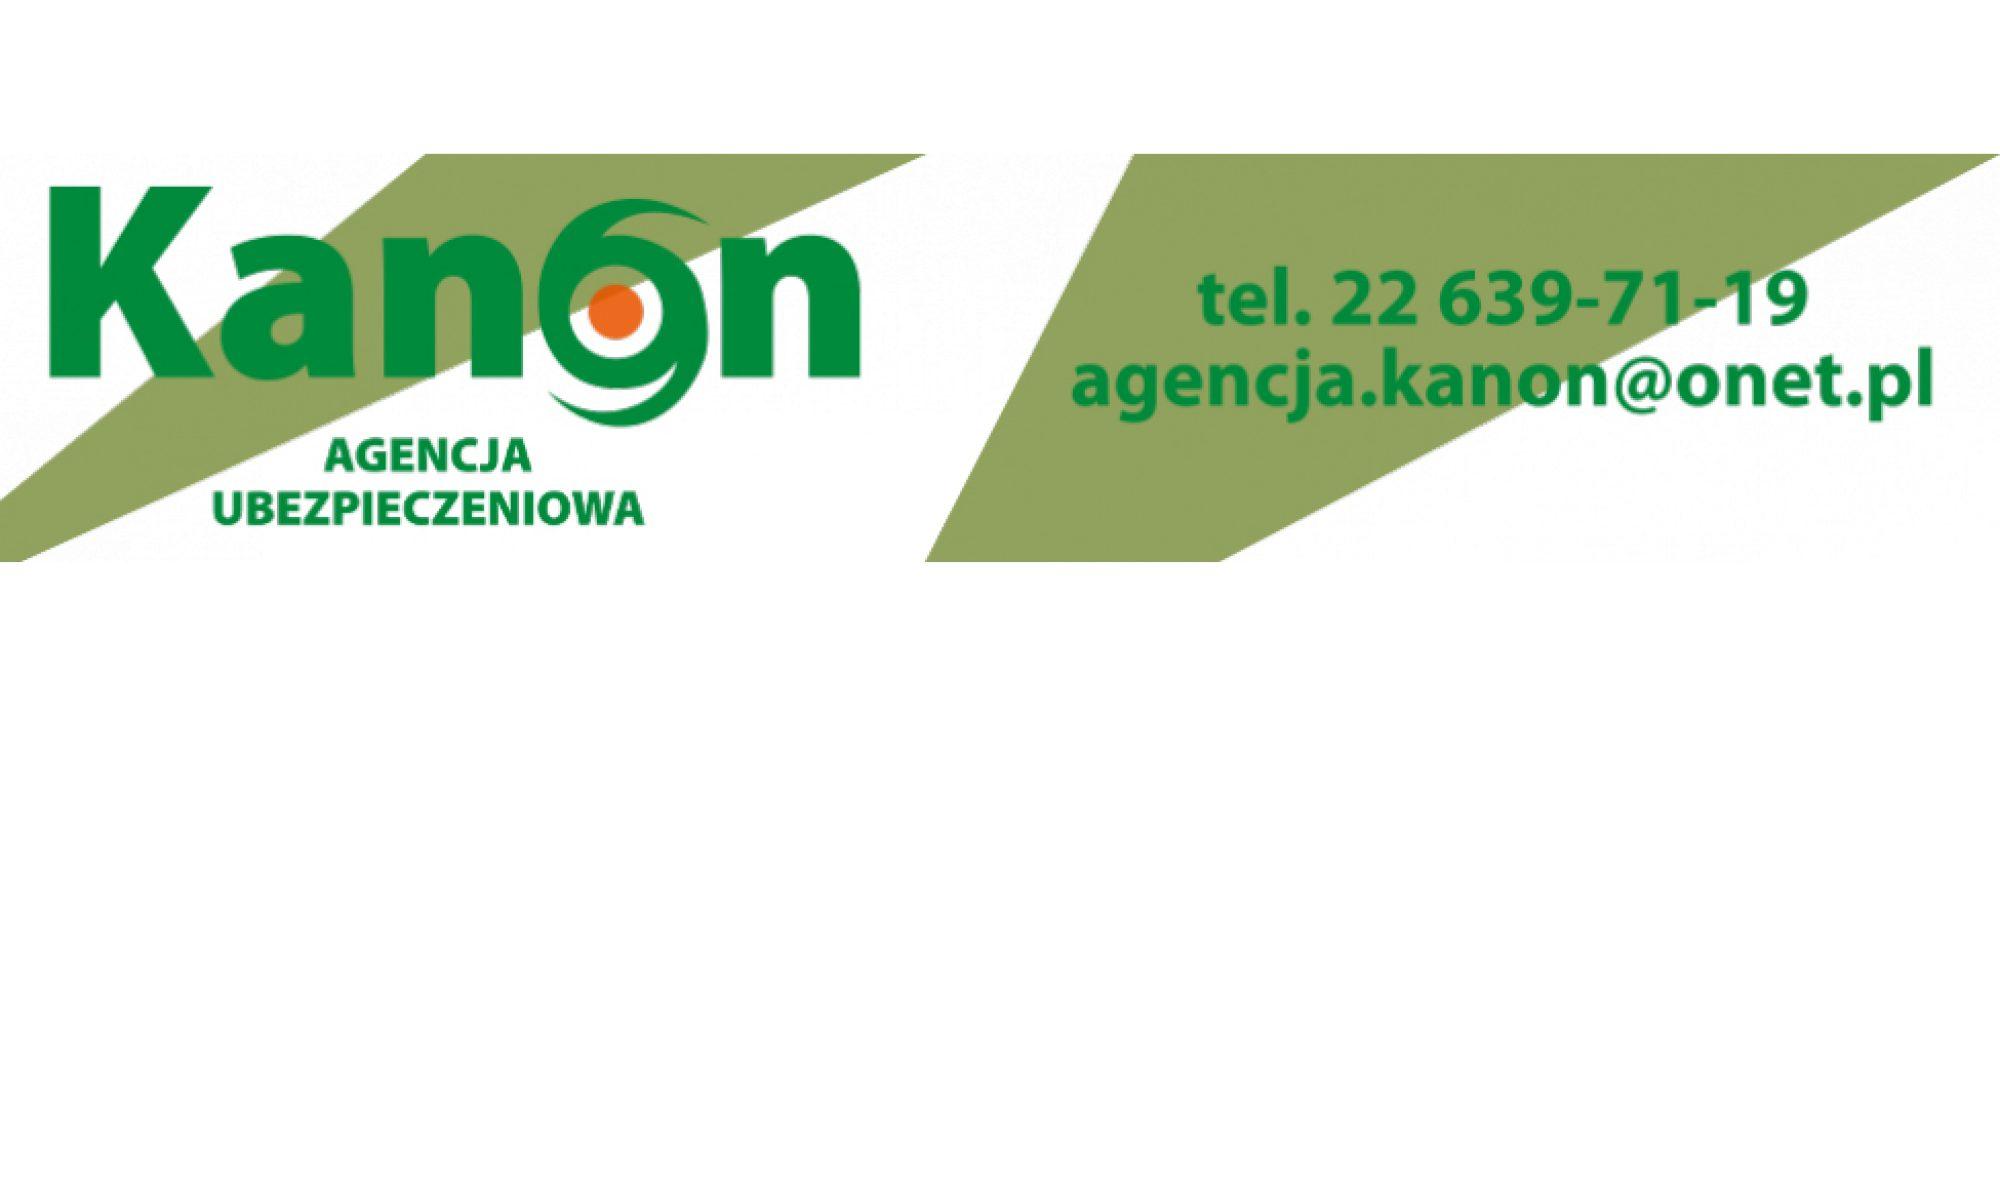 Agencja Ubezpieczeniowa Kanon